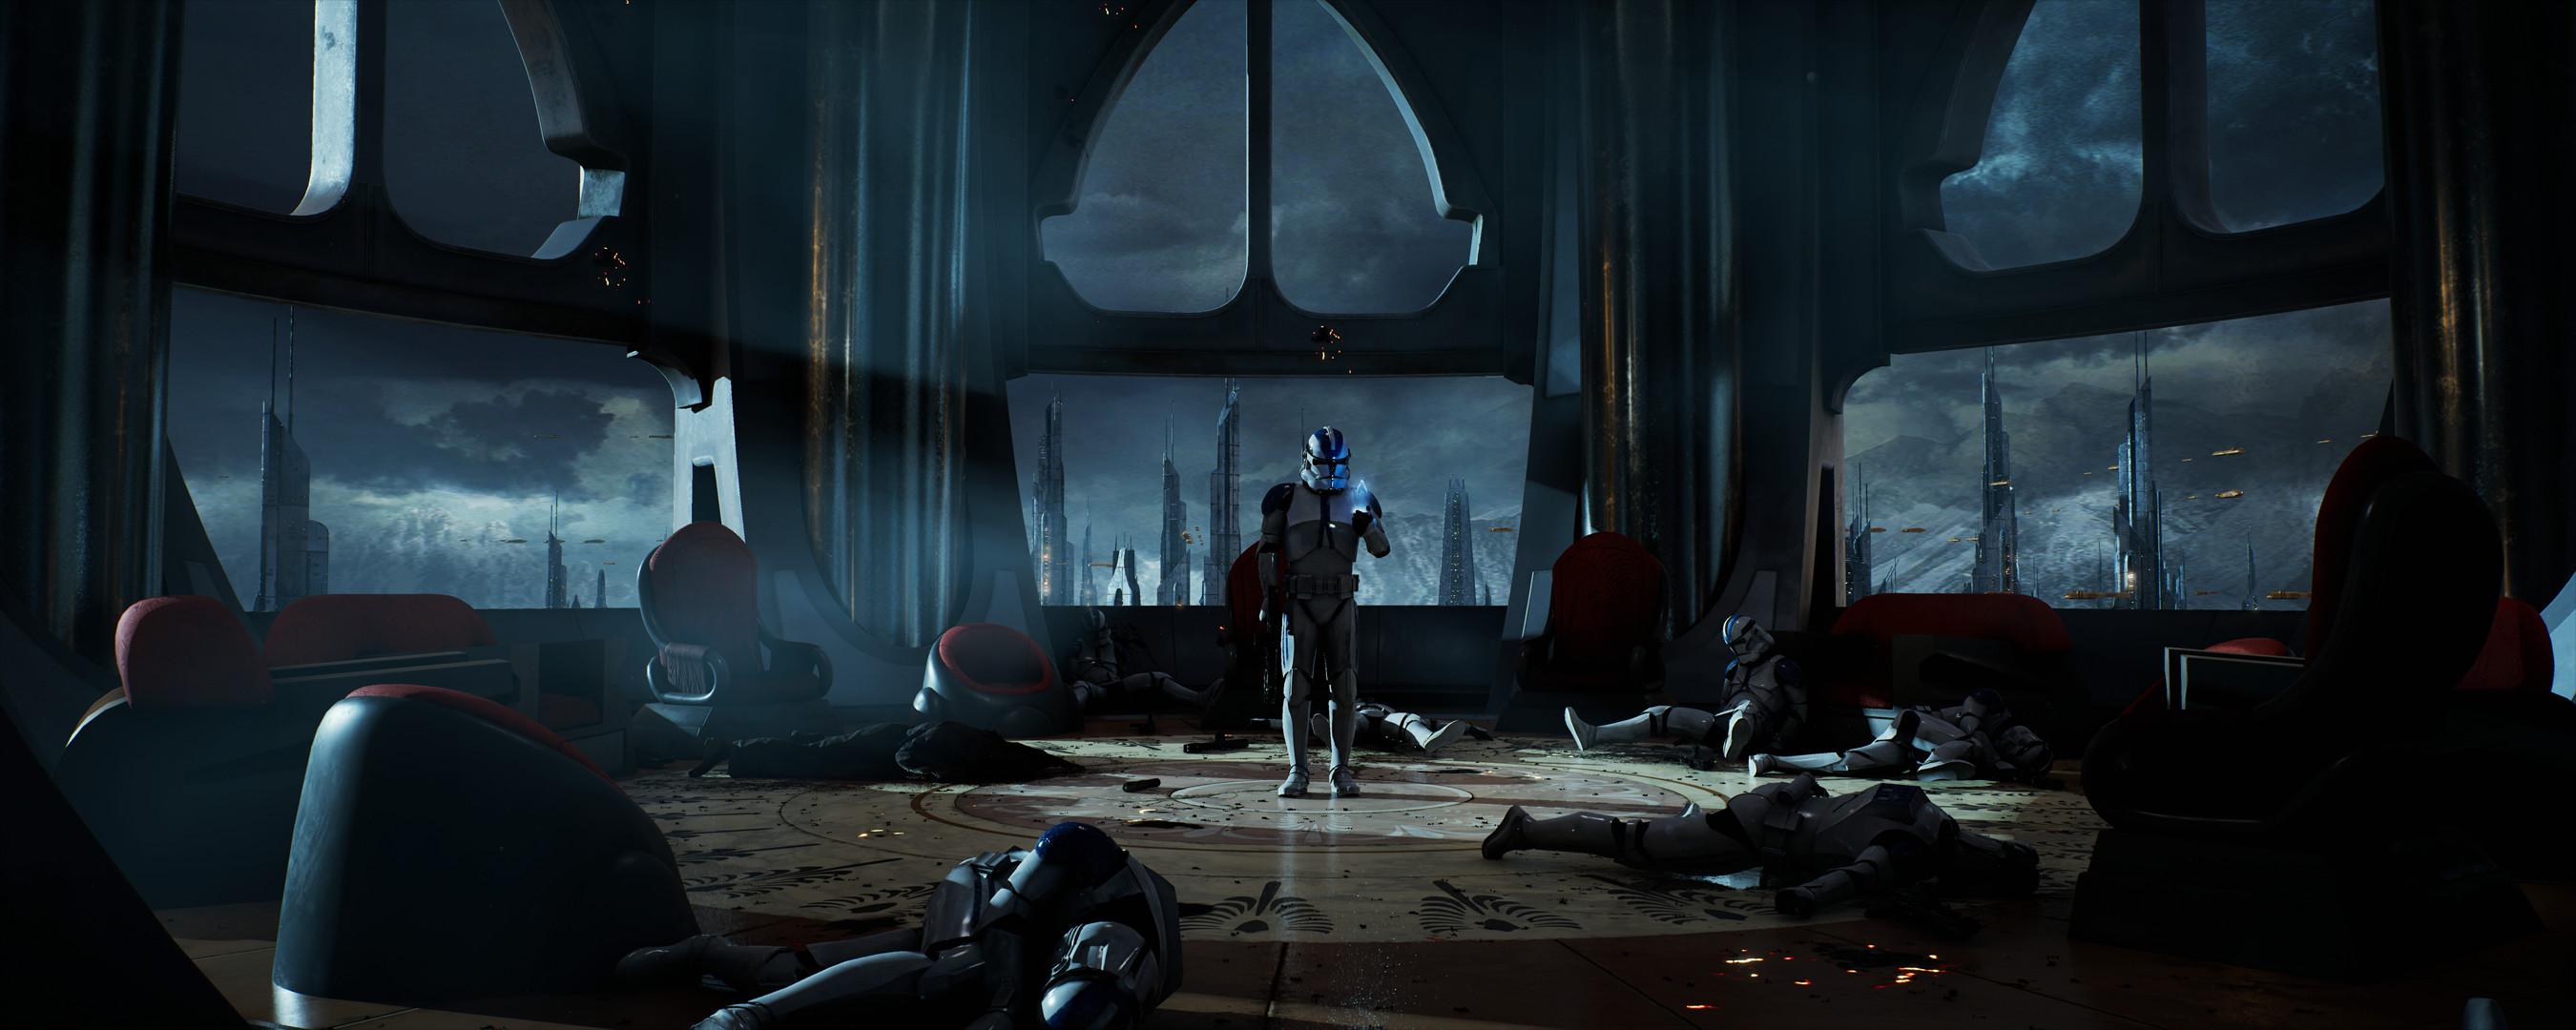 Wallpaper Jedi Temple Dark Star Wars Clone Trooper Coruscant Order 66 2700x1080 Wallpapermaniac 1881855 Hd Wallpapers Wallhere